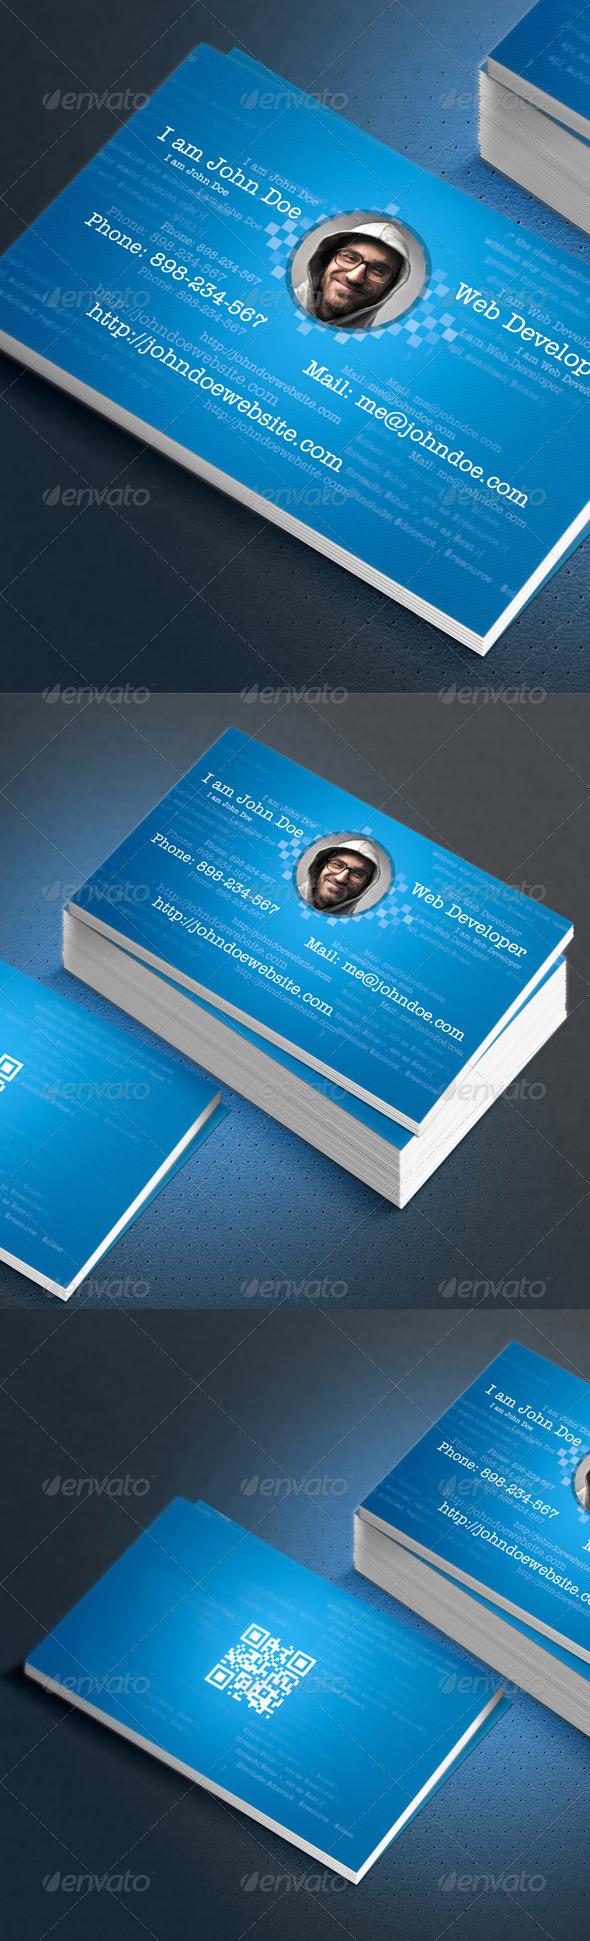 Web Developer Coder FreelancerBusiness Card Design